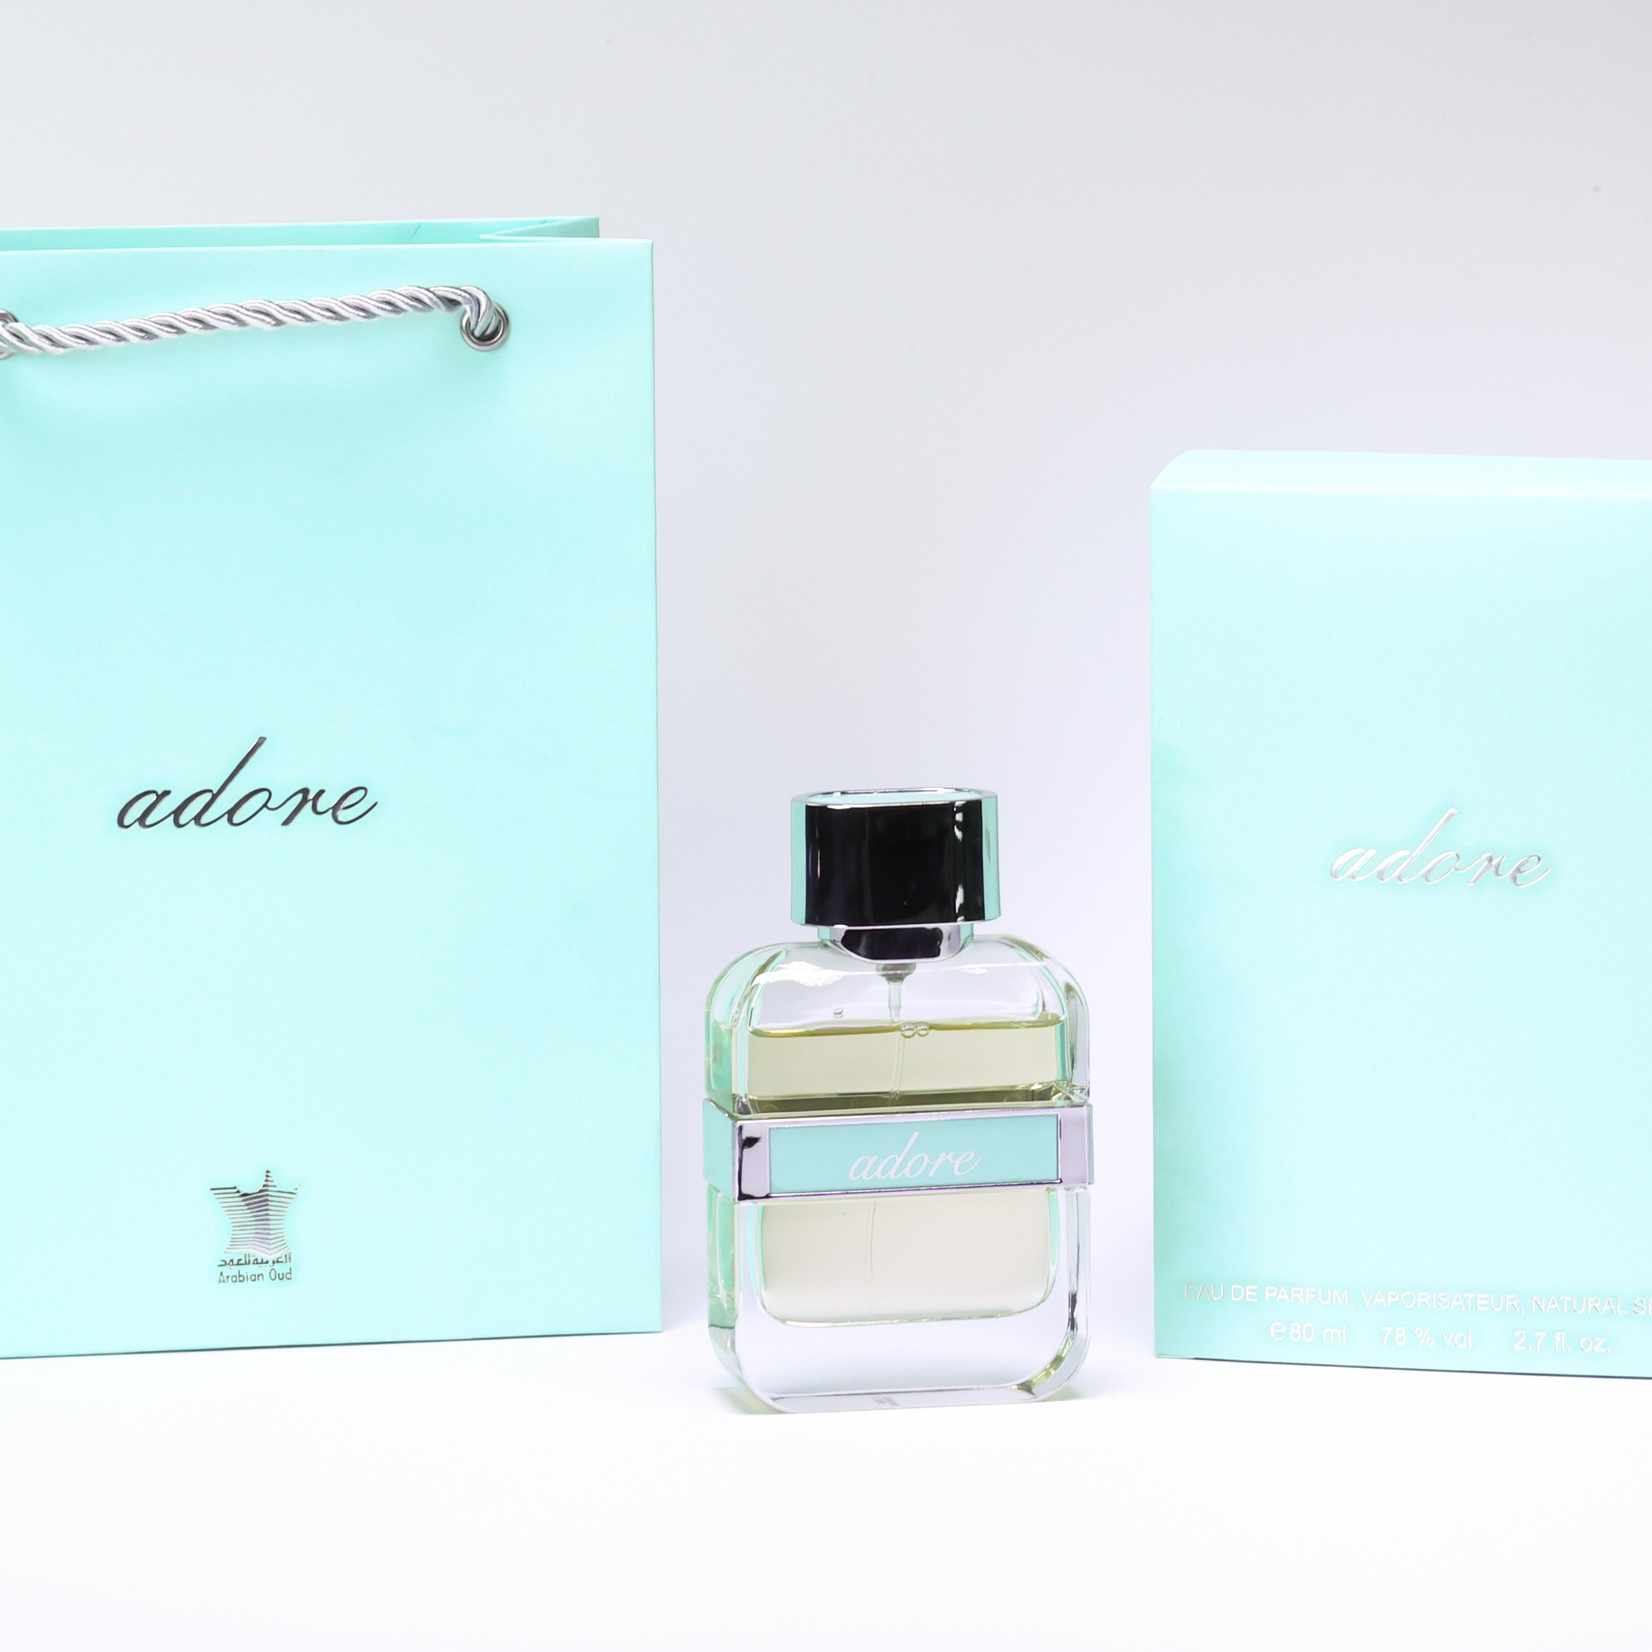 Arabian Oud Adore (80ml Eau de Parfum)